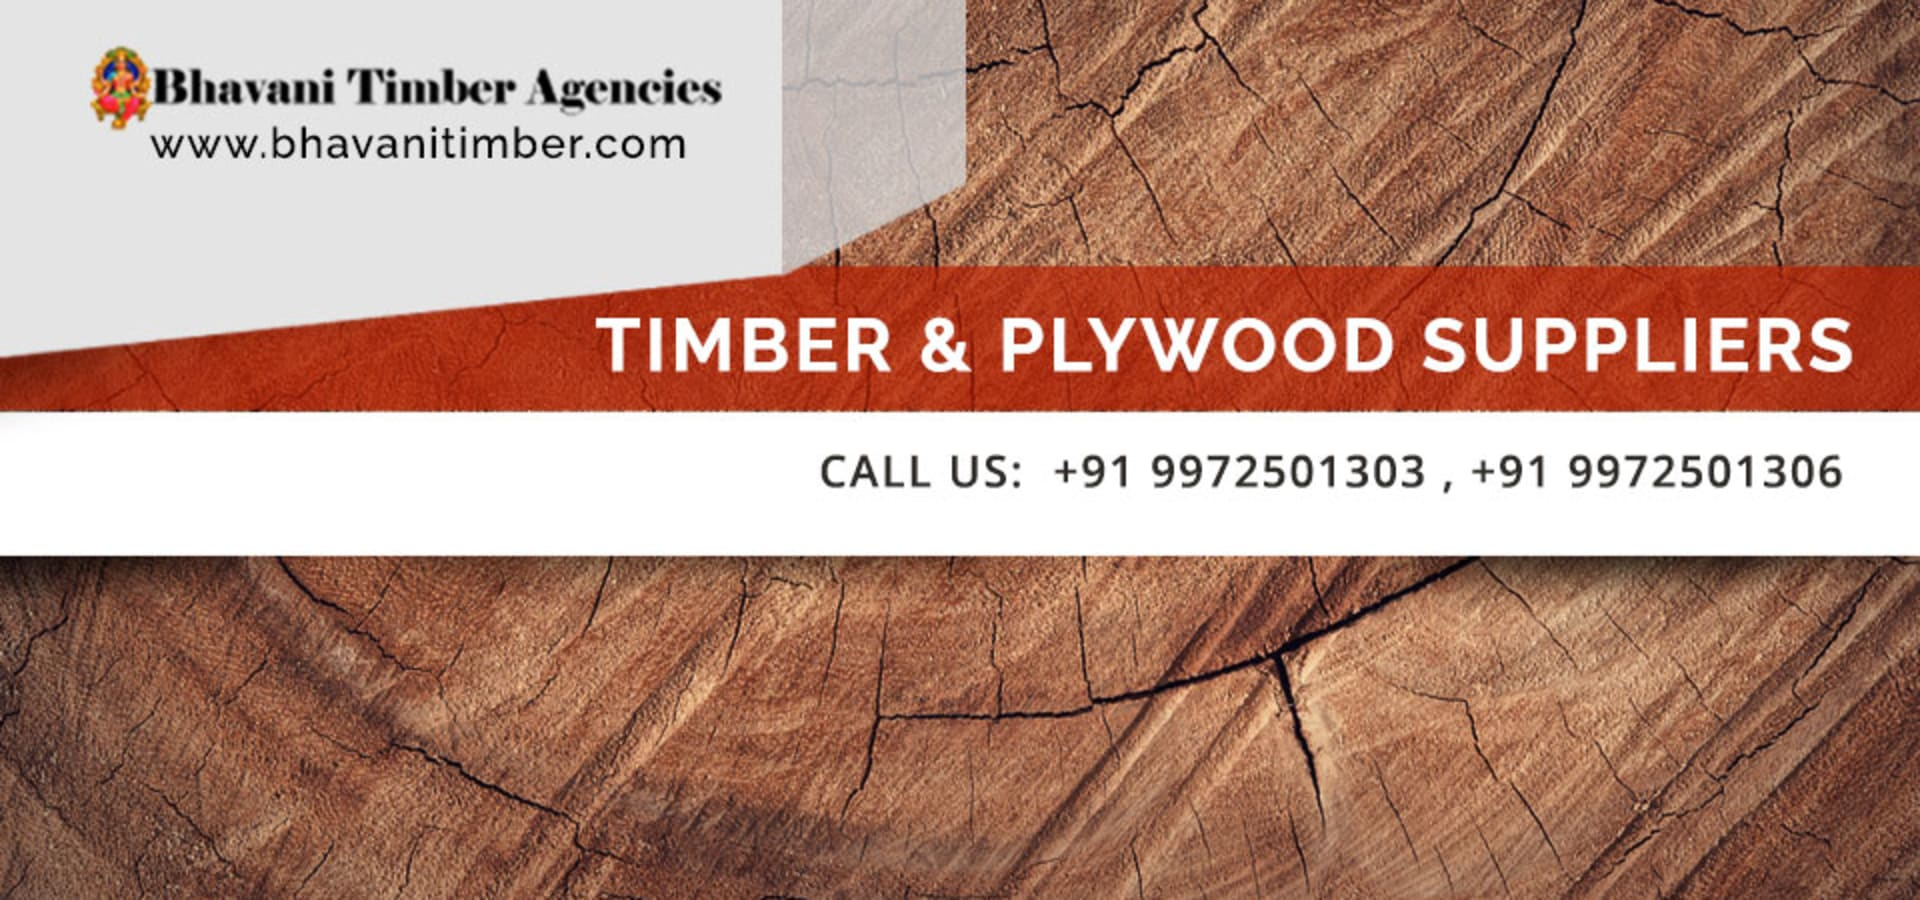 Bhavani Timber Agencies